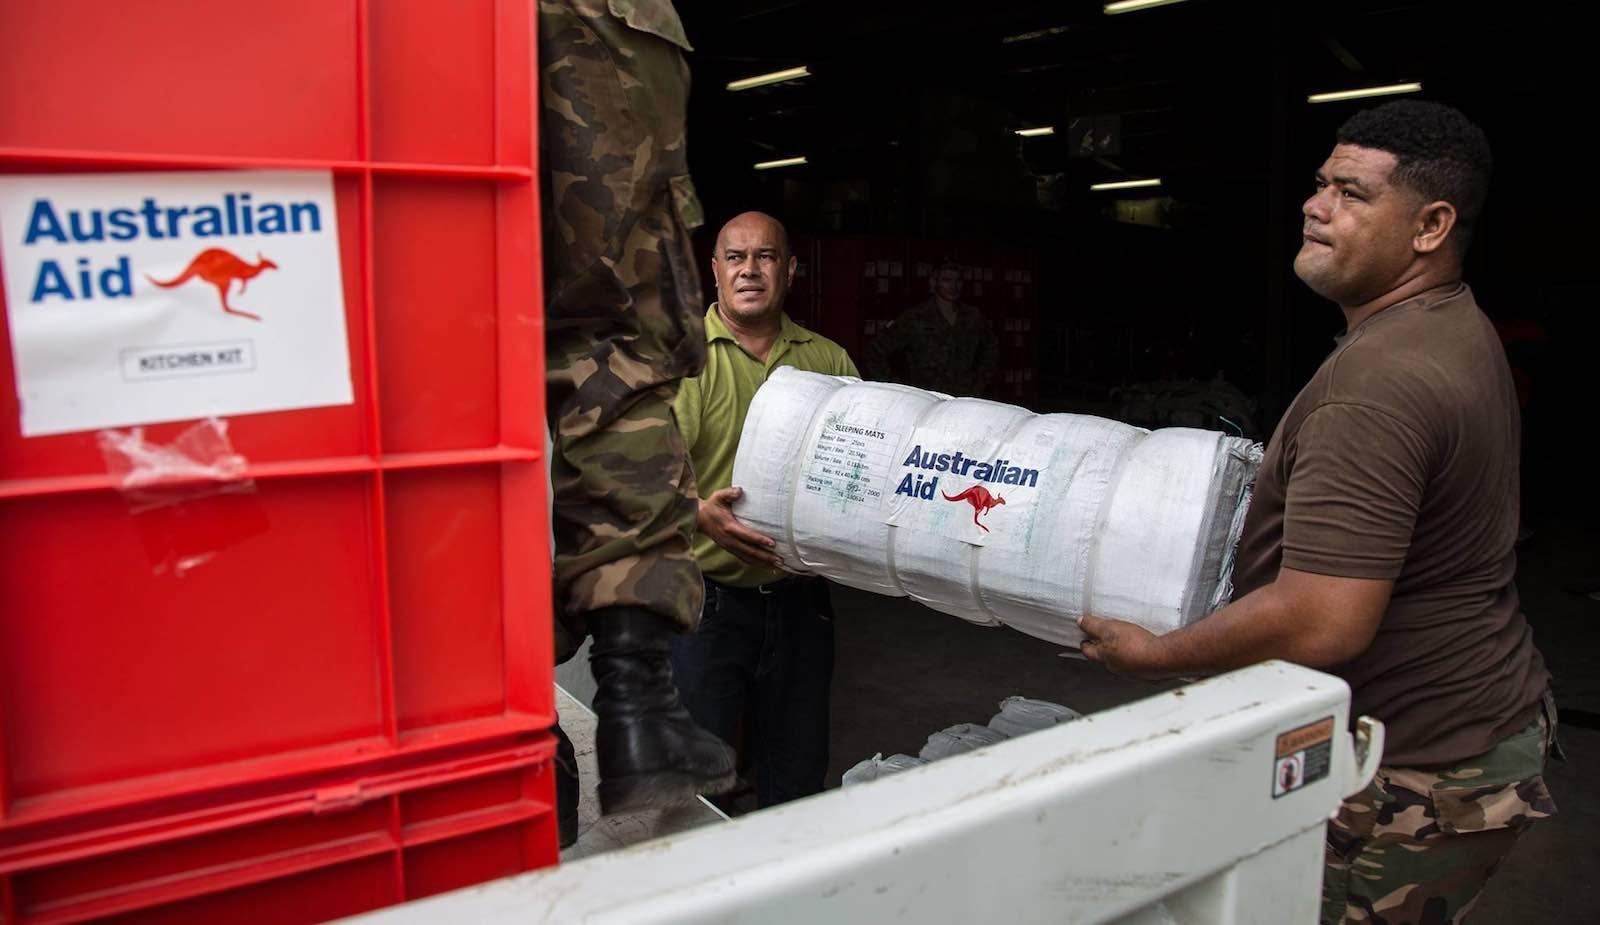 Australian aid Image